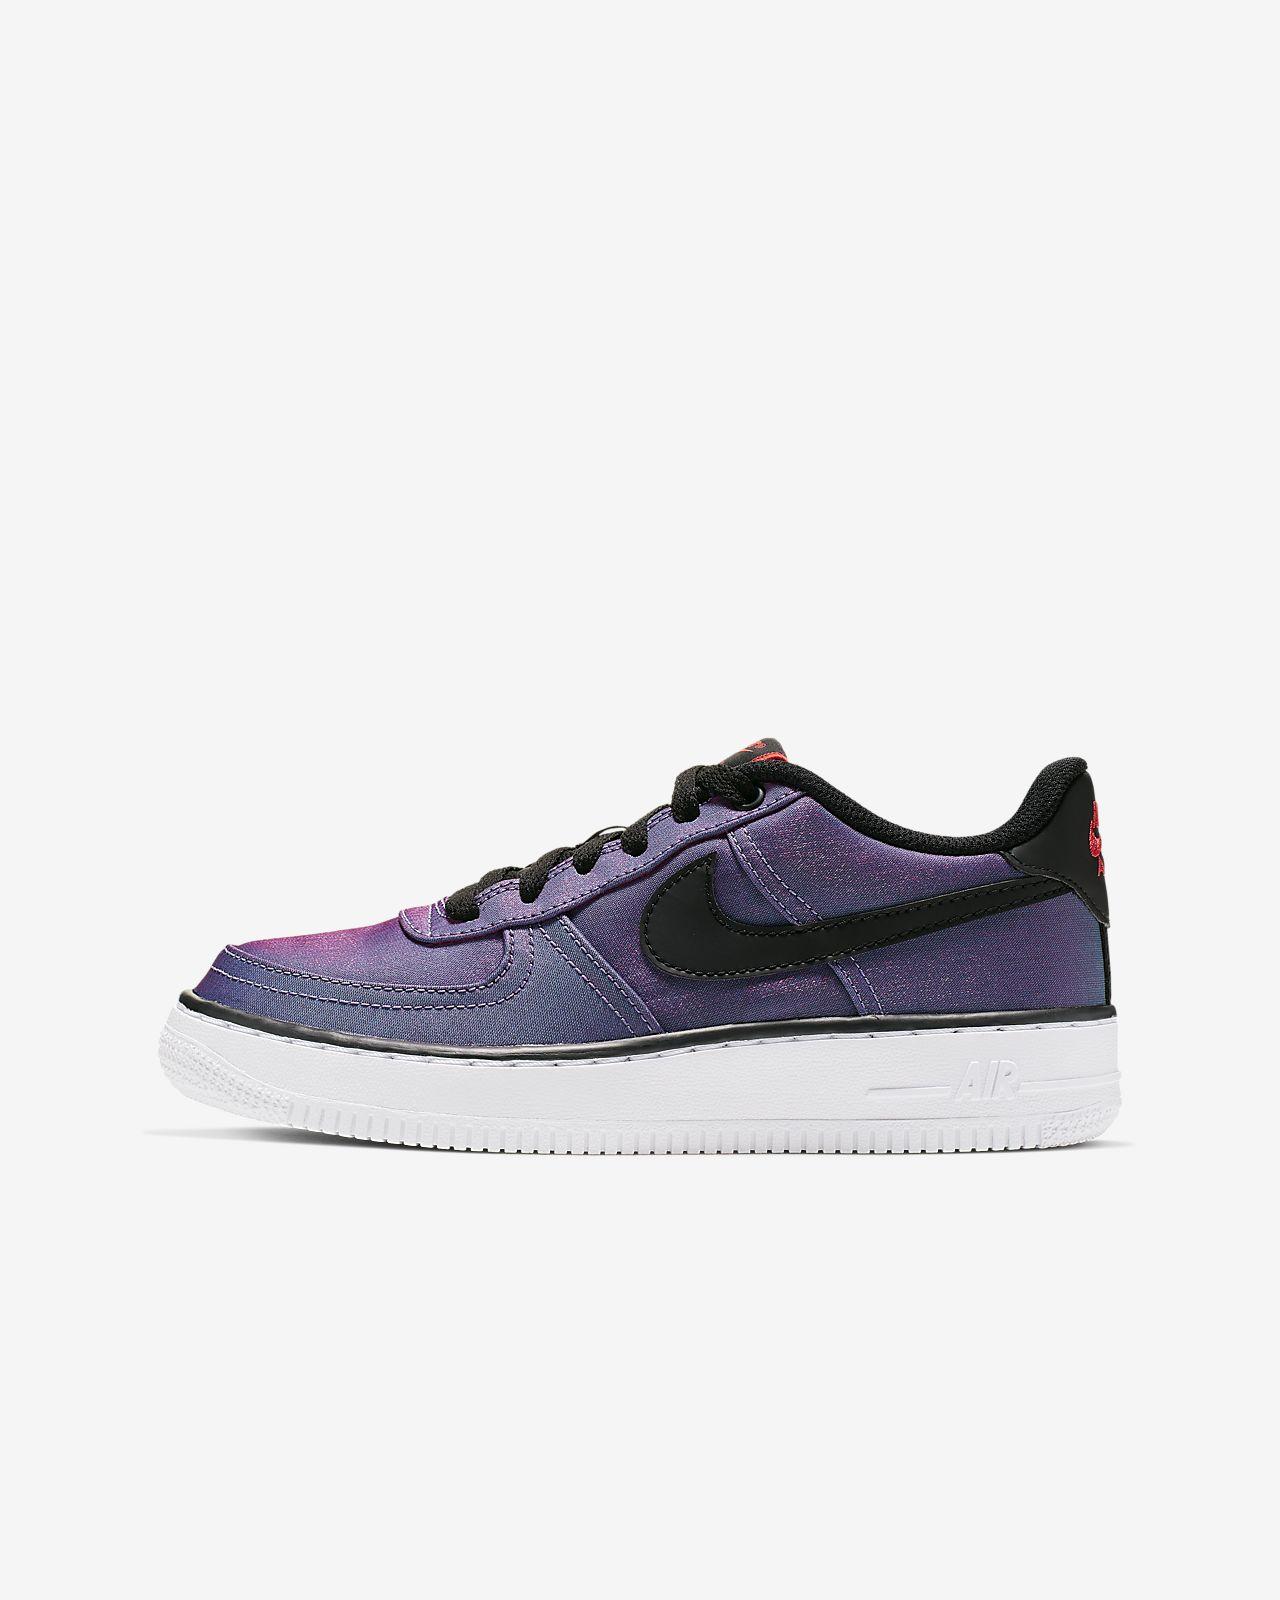 Nike Air Force 1 LV8 Shift Schuh für ältere Kinder